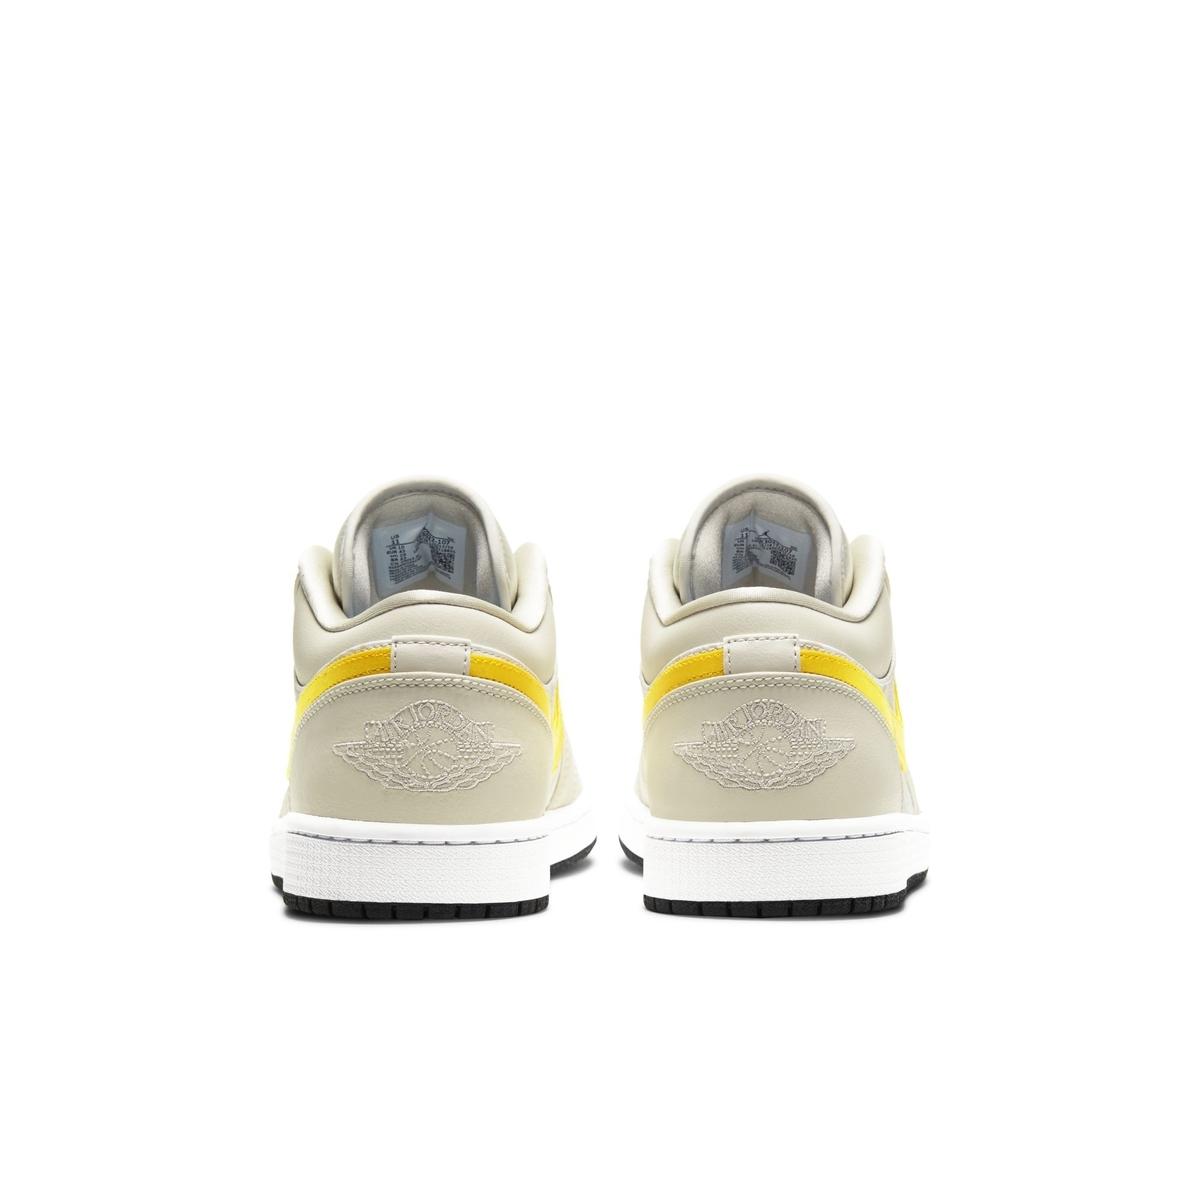 Air Jordan 1 Low,AJ1 Low,发售 麻叶花纹 + 工装造型!这双 Air Jordan 1 Low 新品不容小觑!